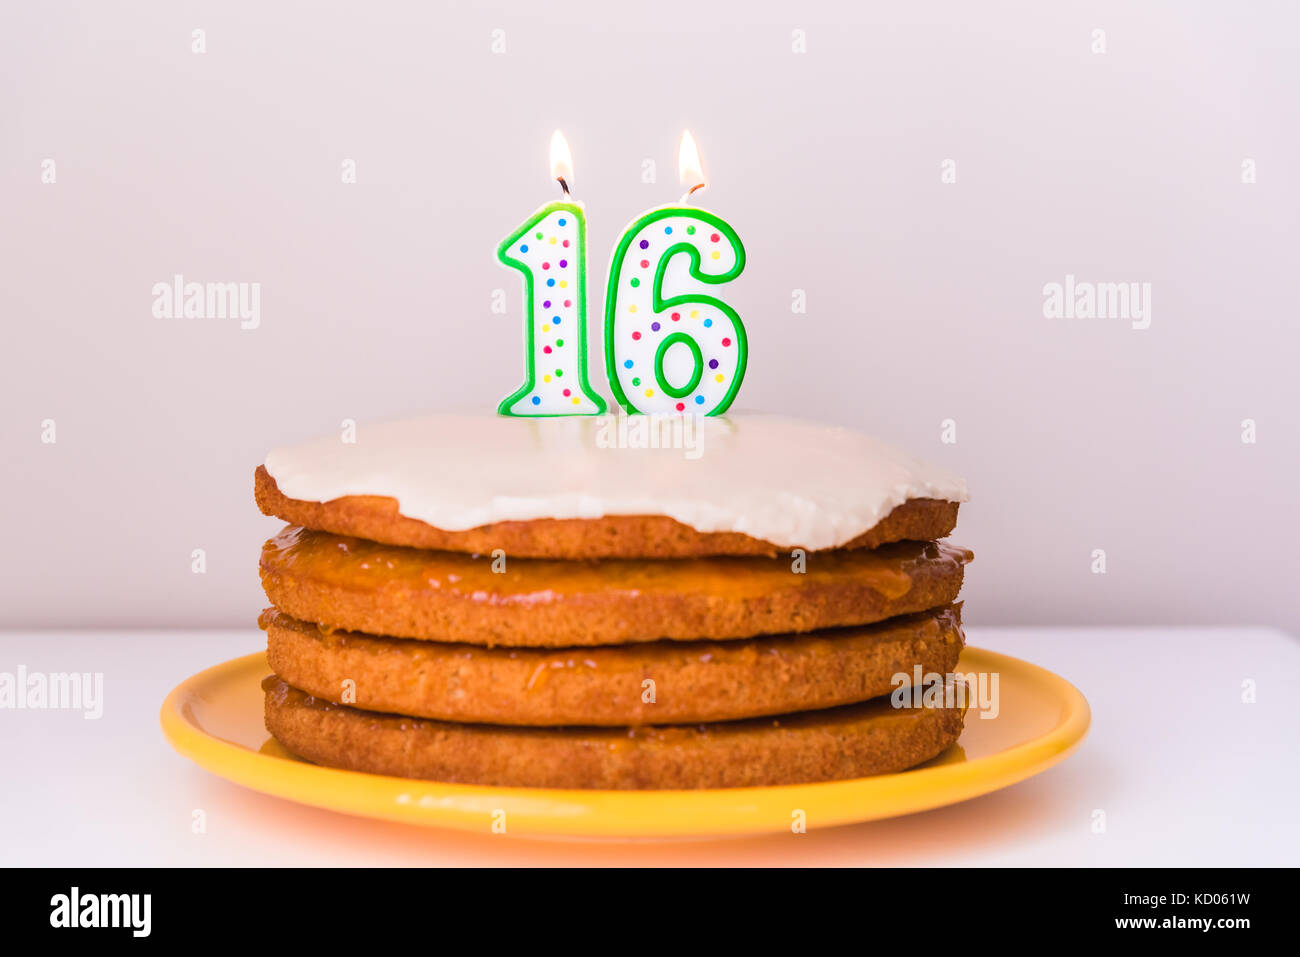 sixteenth birthday stock photos sixteenth birthday stock images